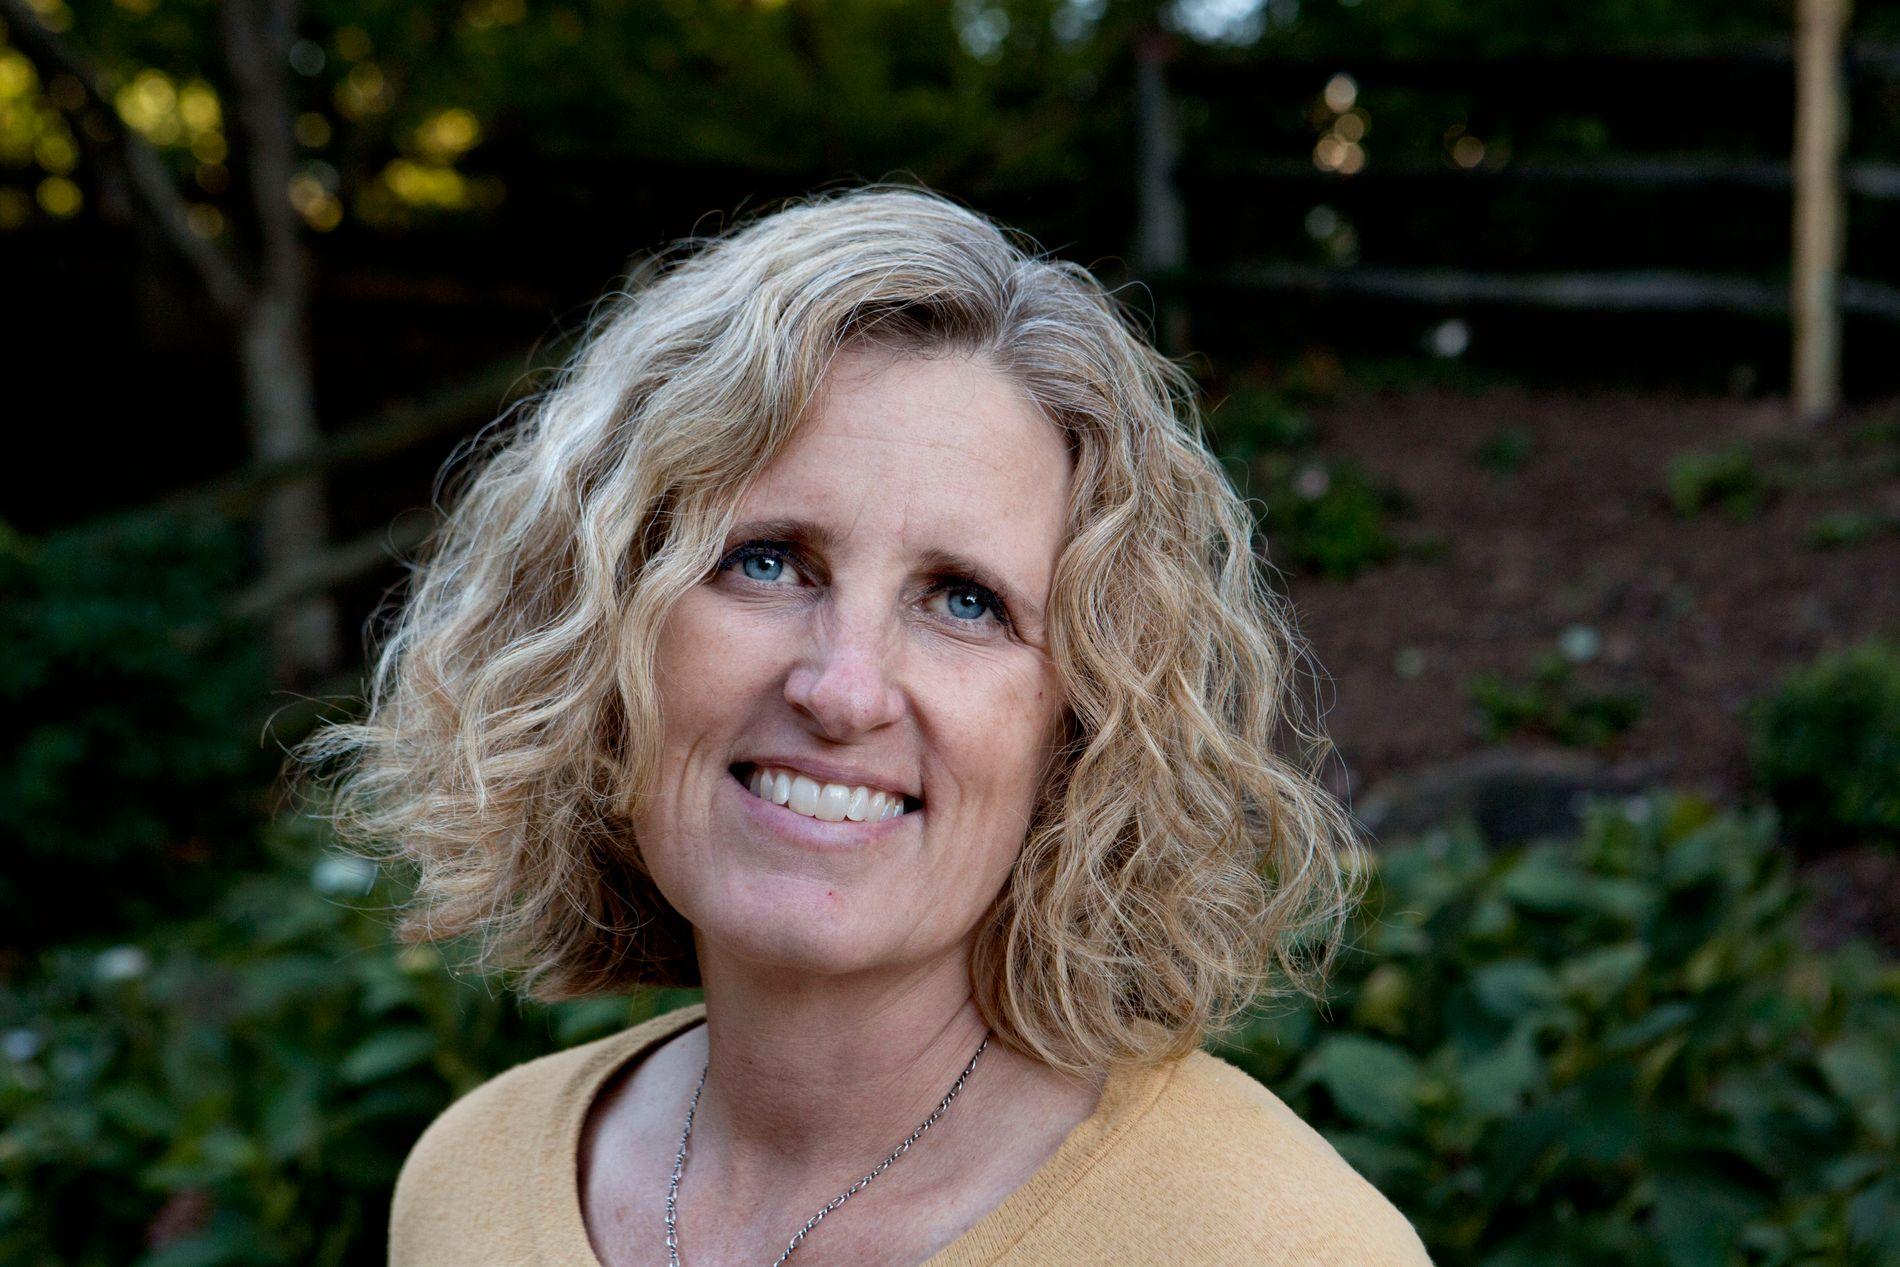 KAMPKLAR: Juli Briskman har startet sin valgkampanje for en plass i fylkesstyret.